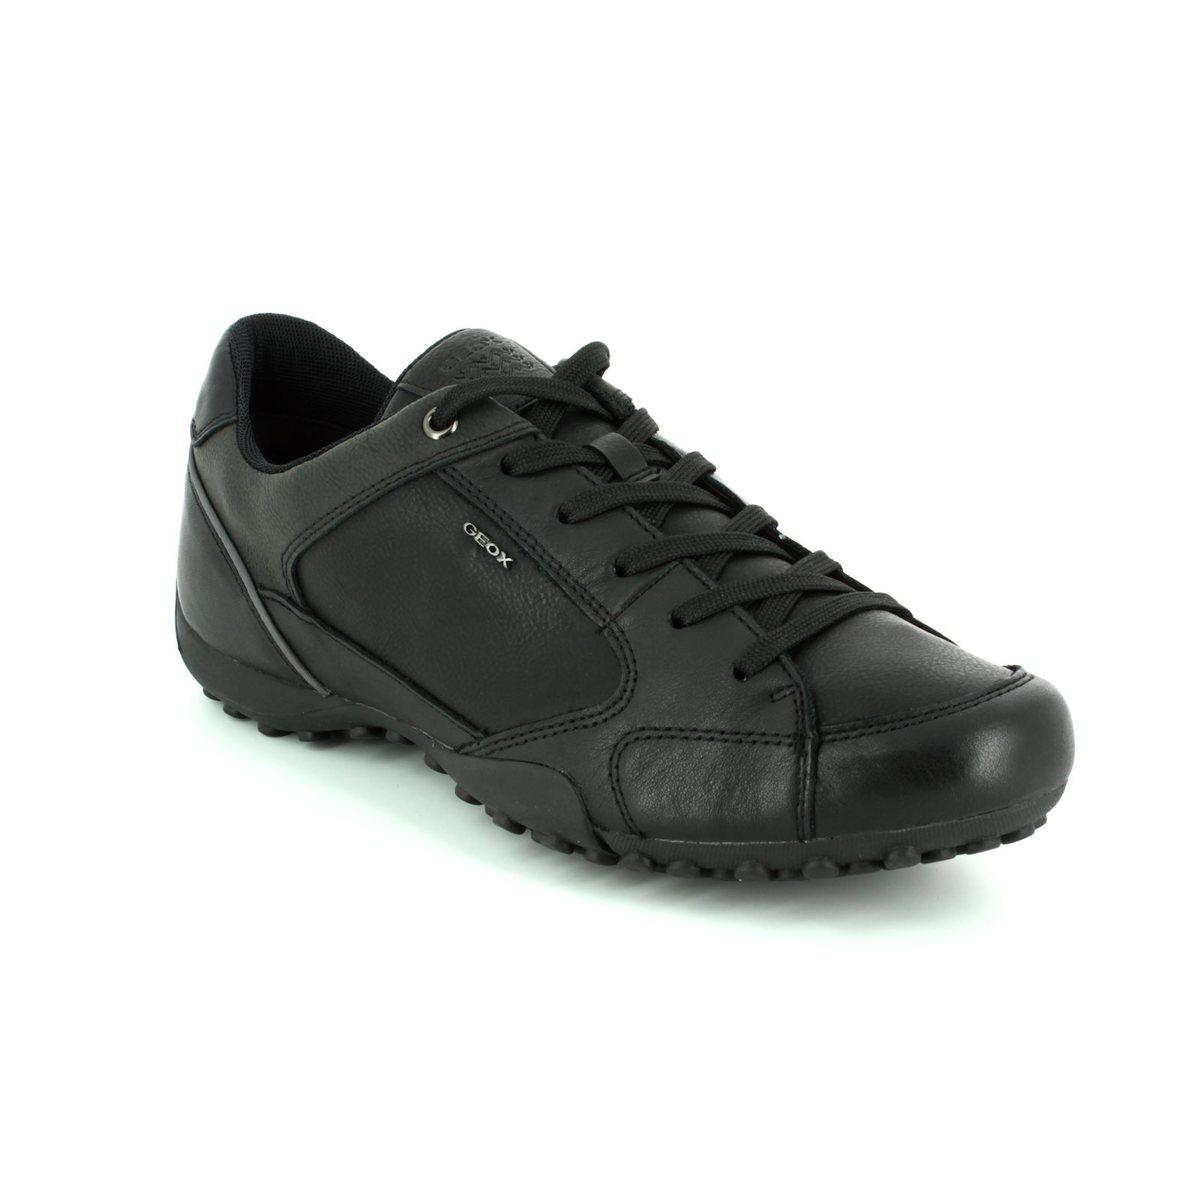 Geox Casual Shoes - Black - U7407A C9999 UOMO SNAKE A 70b274d1bd3